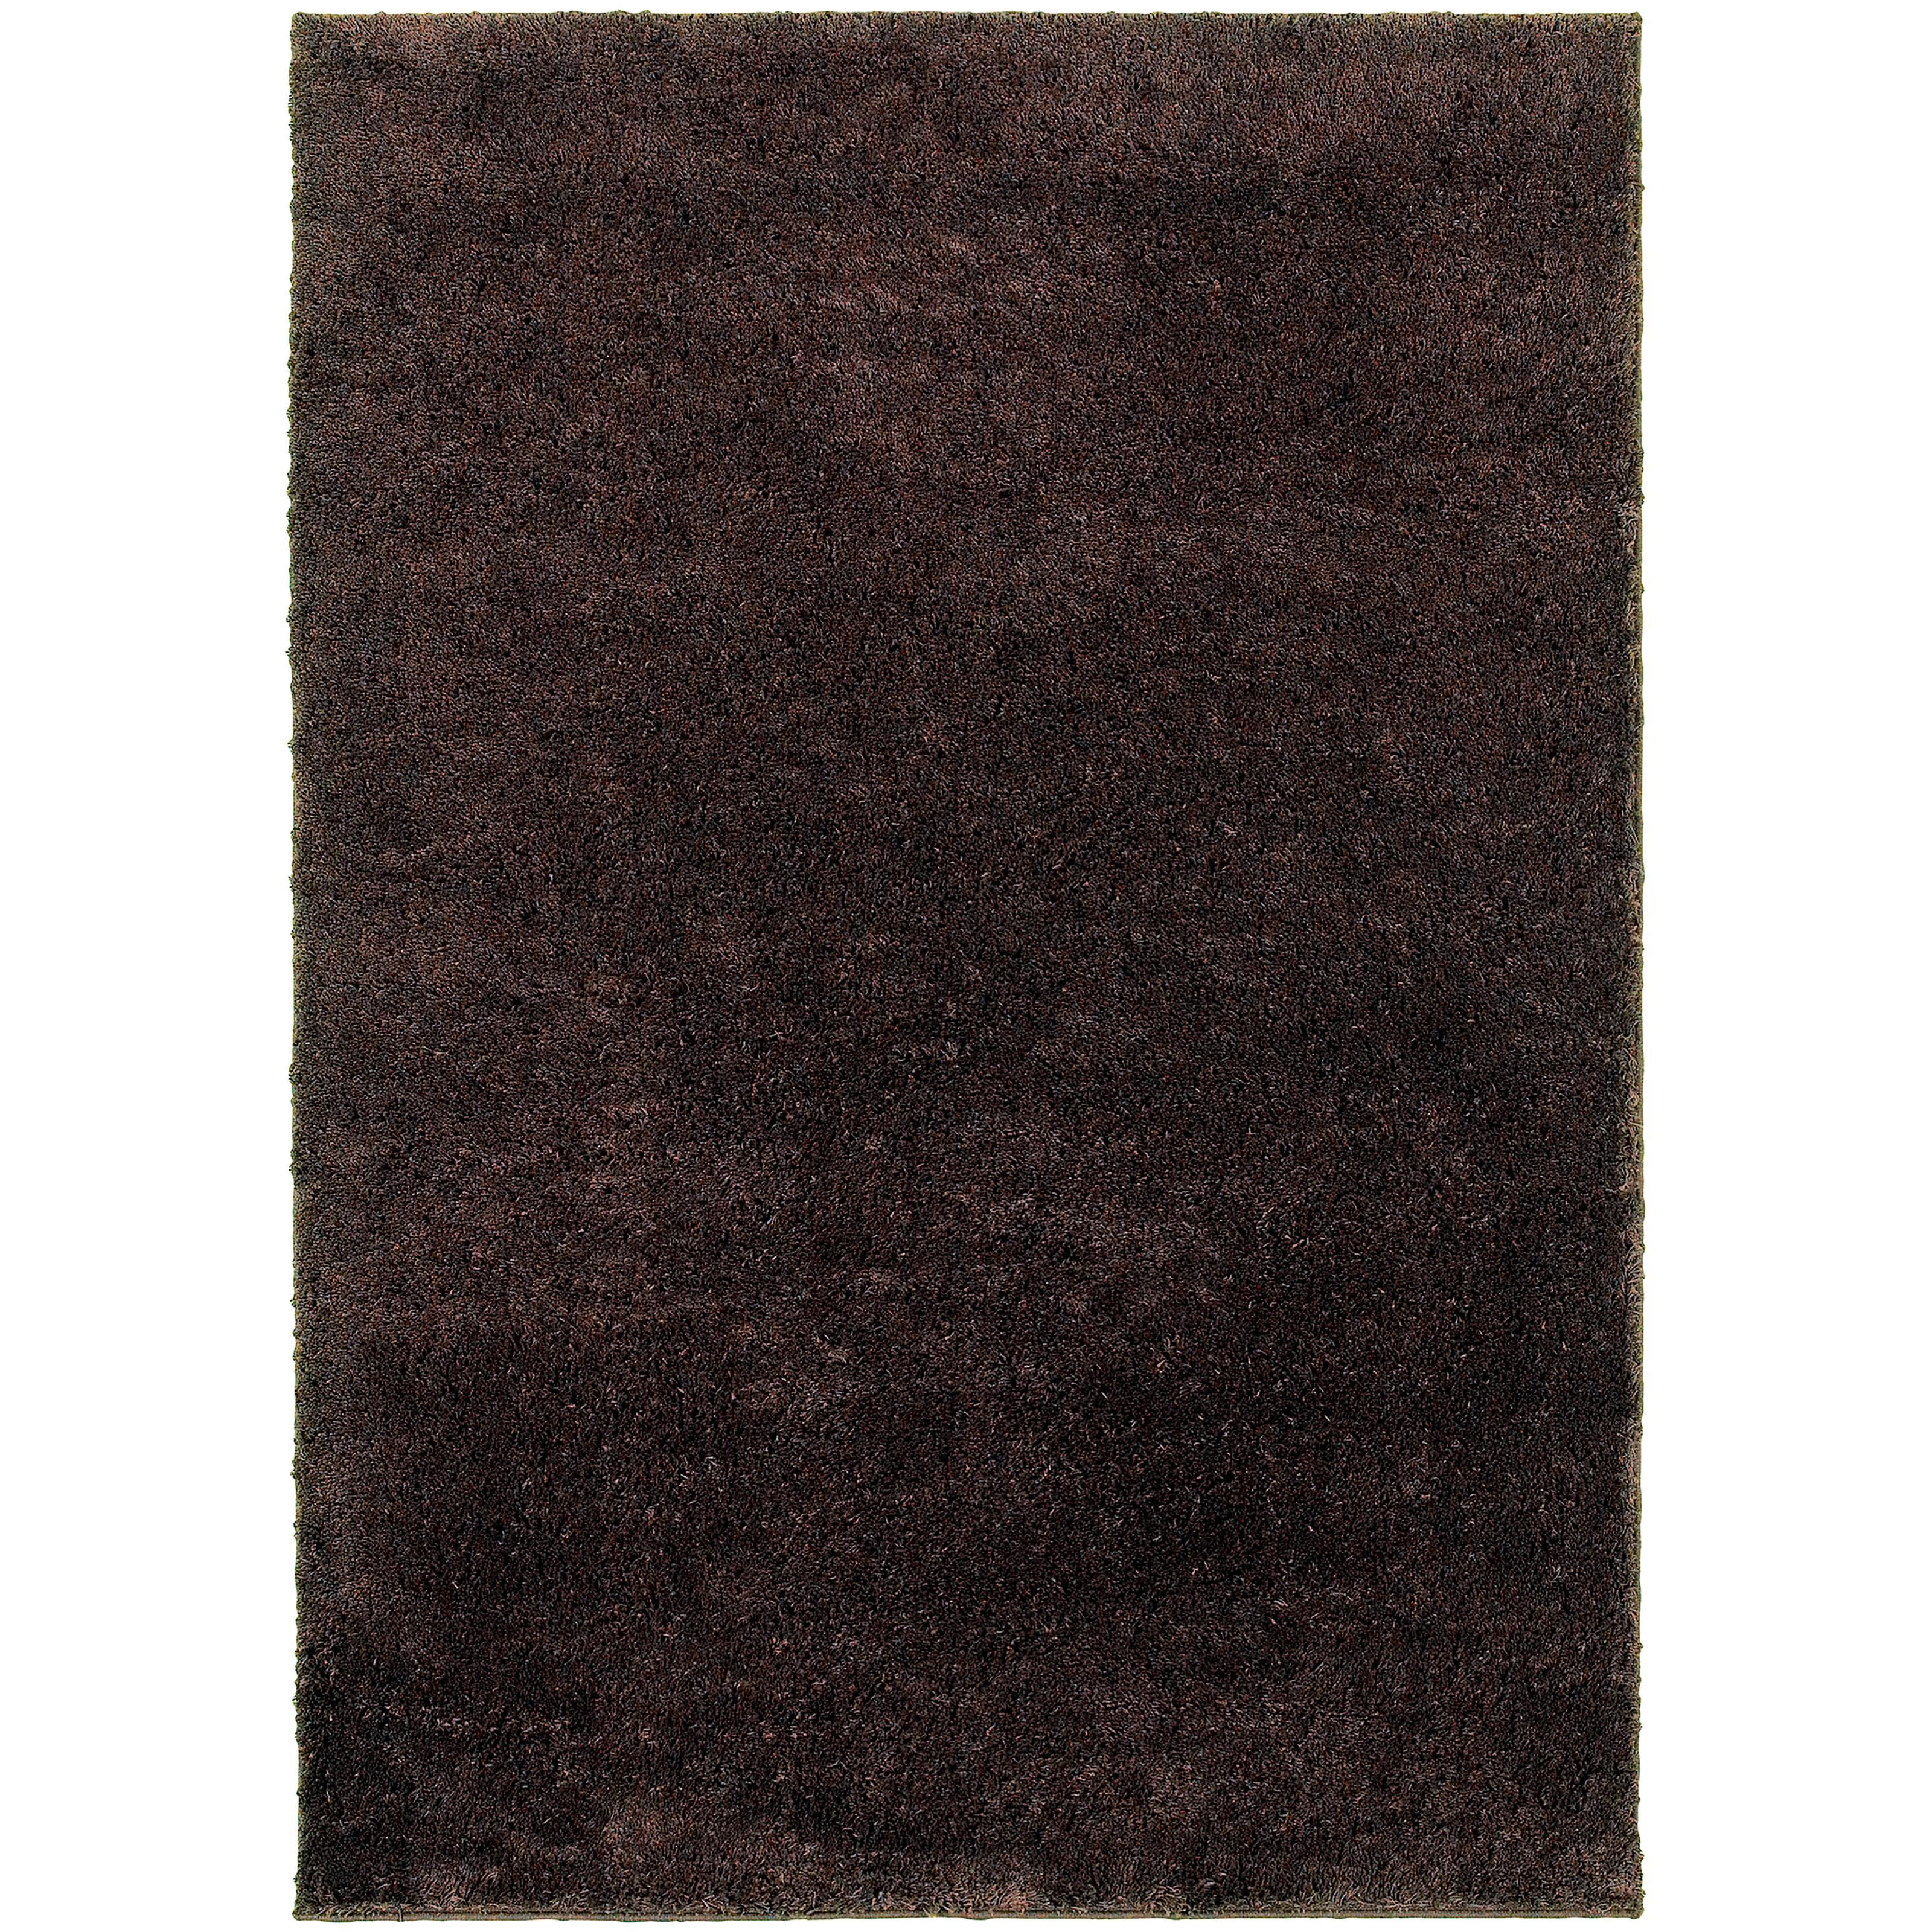 "Oriental Weavers Impressions 5' 3"" X  7' 3"" Rug - Item Number: I4500160220ST"